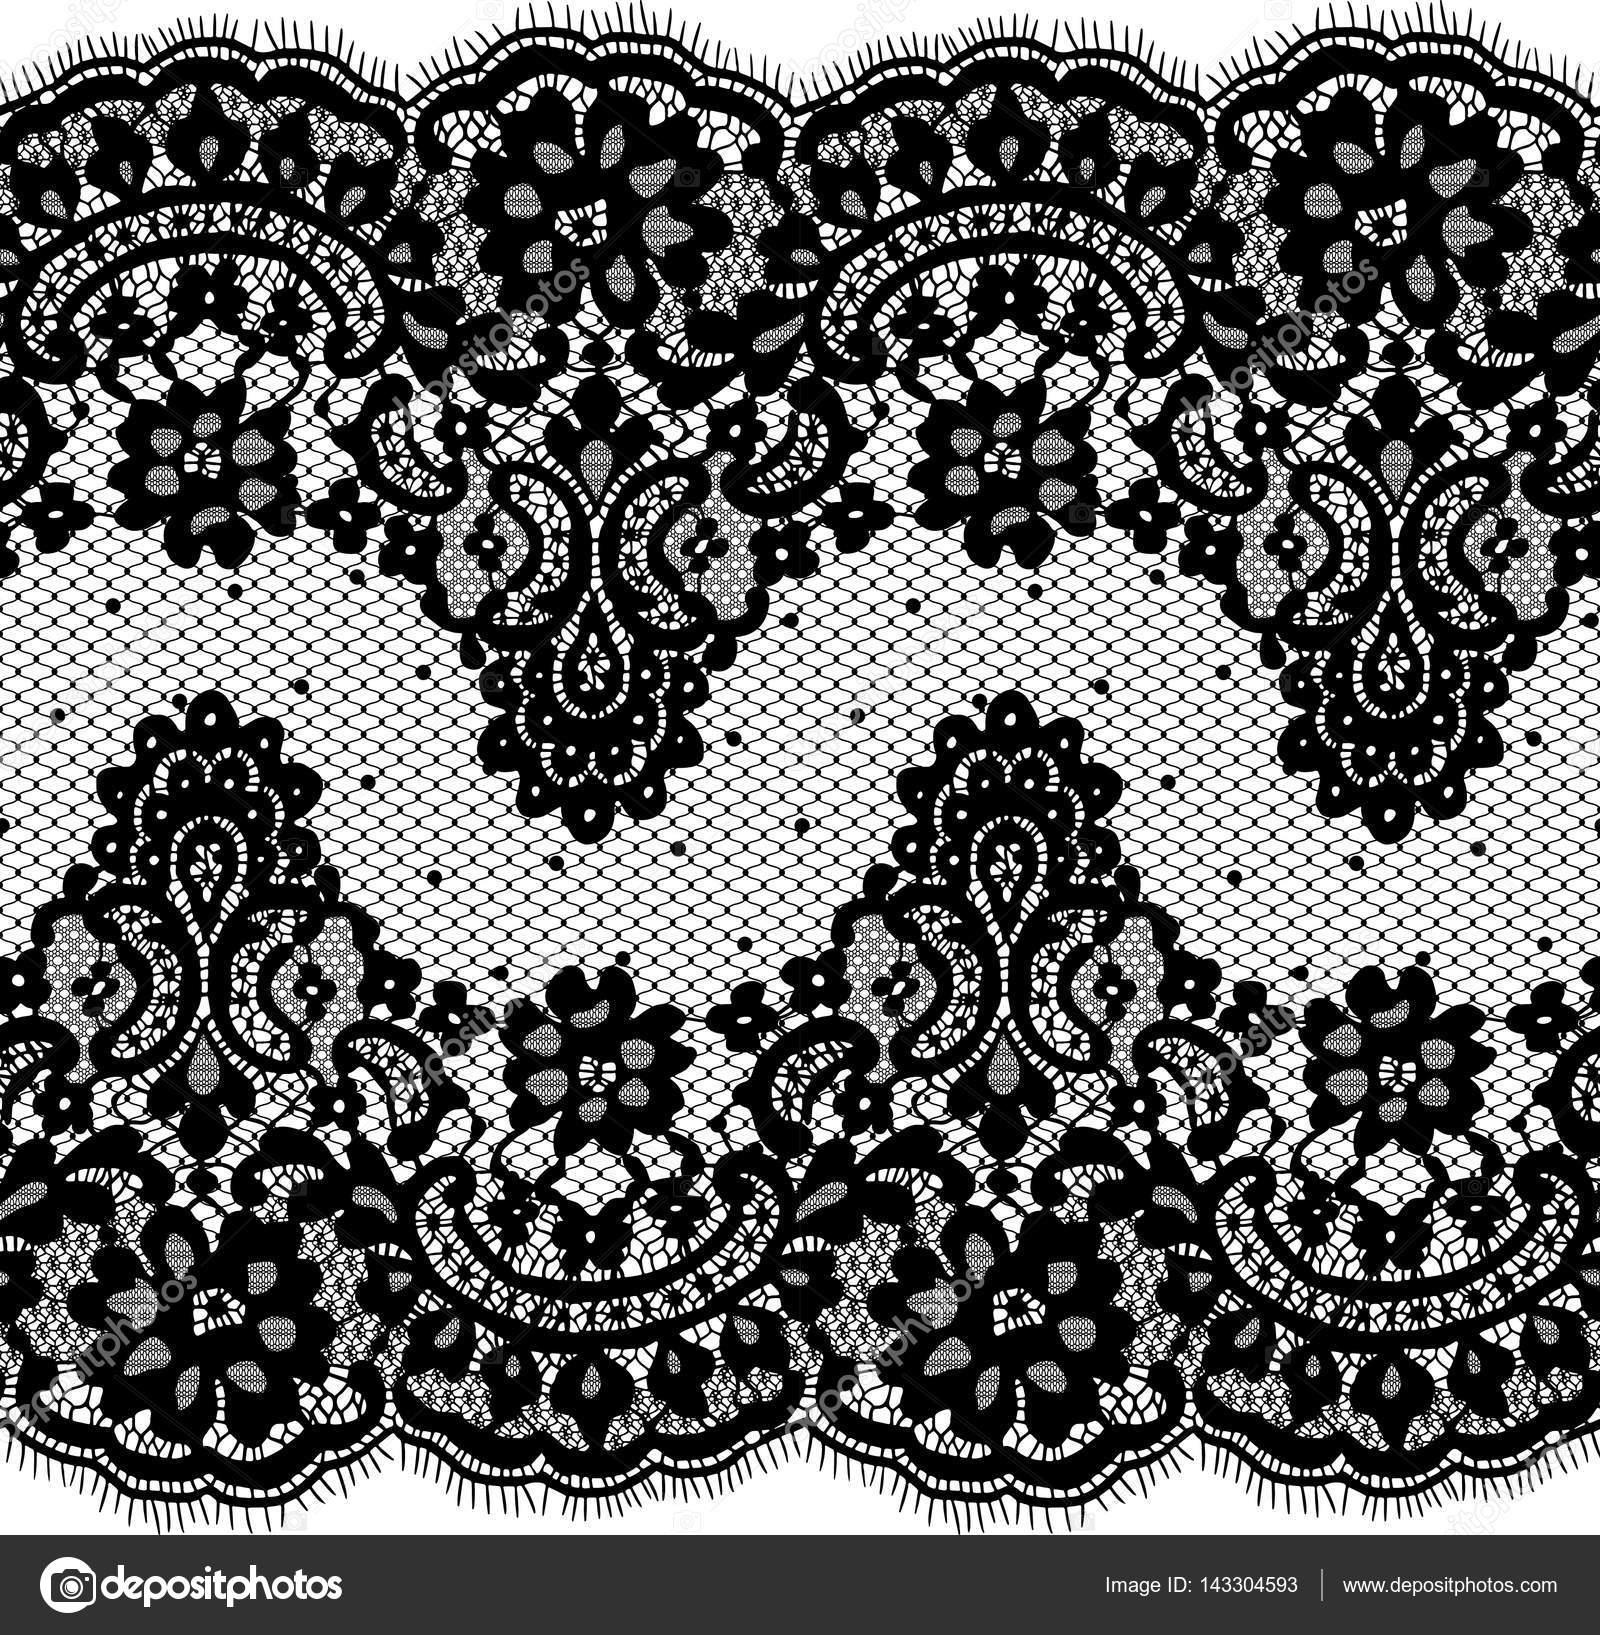 seamless black vector lace pattern stock vector maryswell 143304593 rh depositphotos com seamless black vector lace pattern seamless vector lace pattern